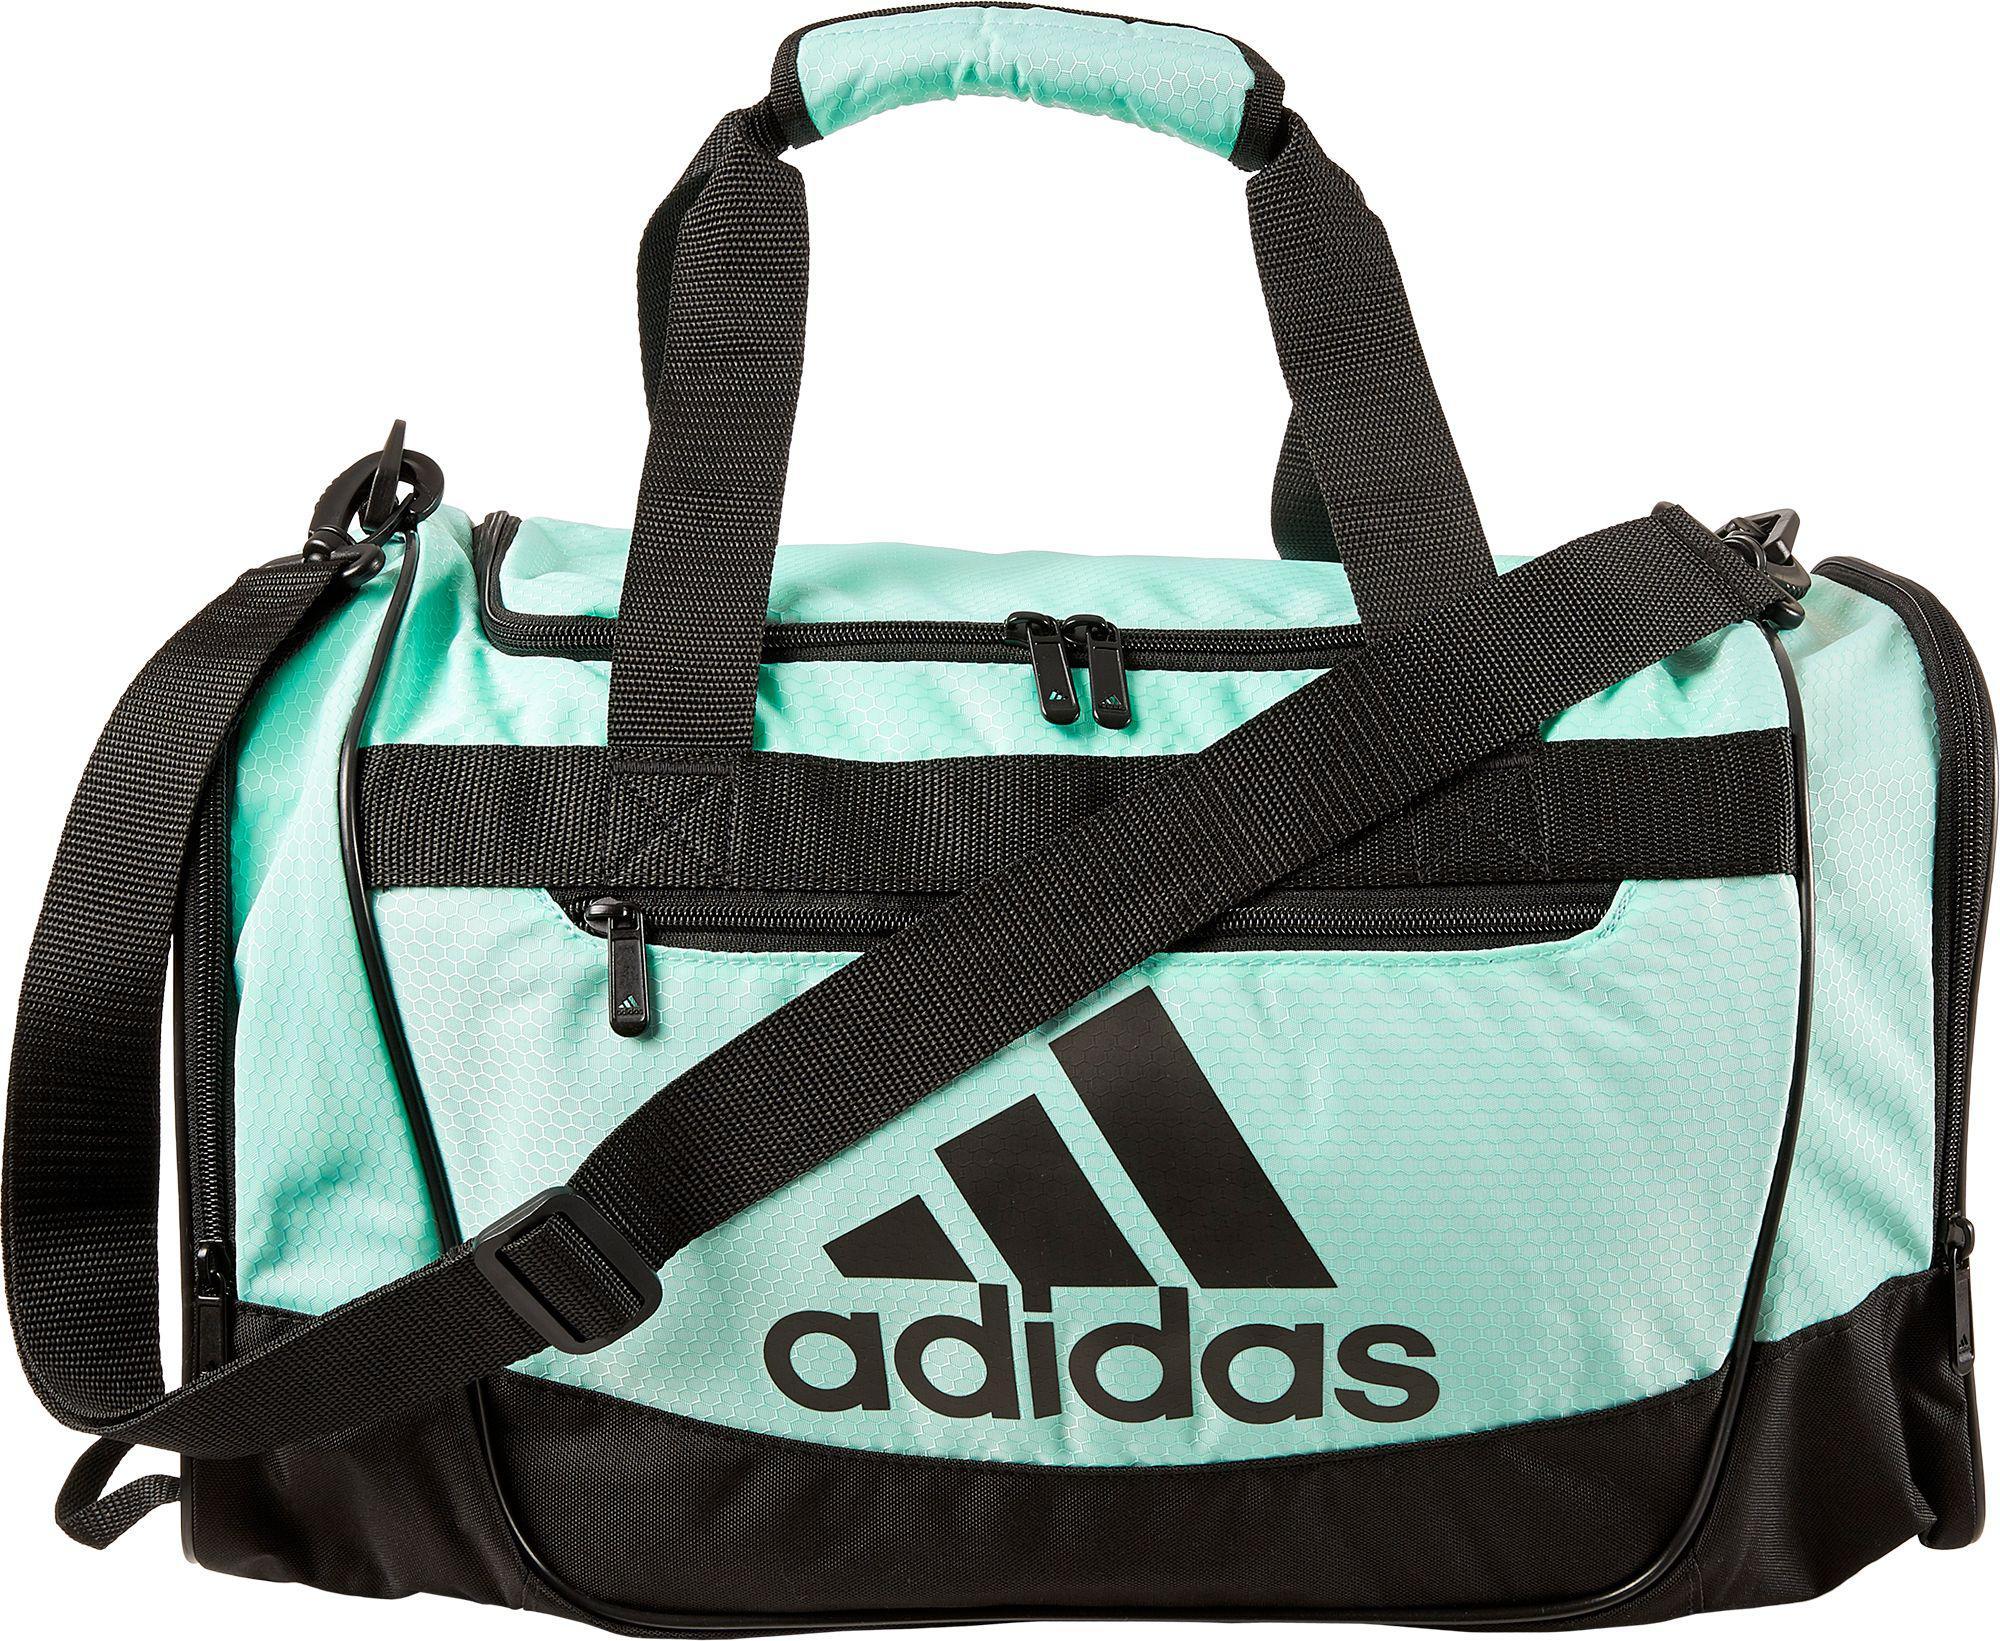 4a8db667ac Lyst - adidas Defender Iii Small Duffle Bag in Green for Men